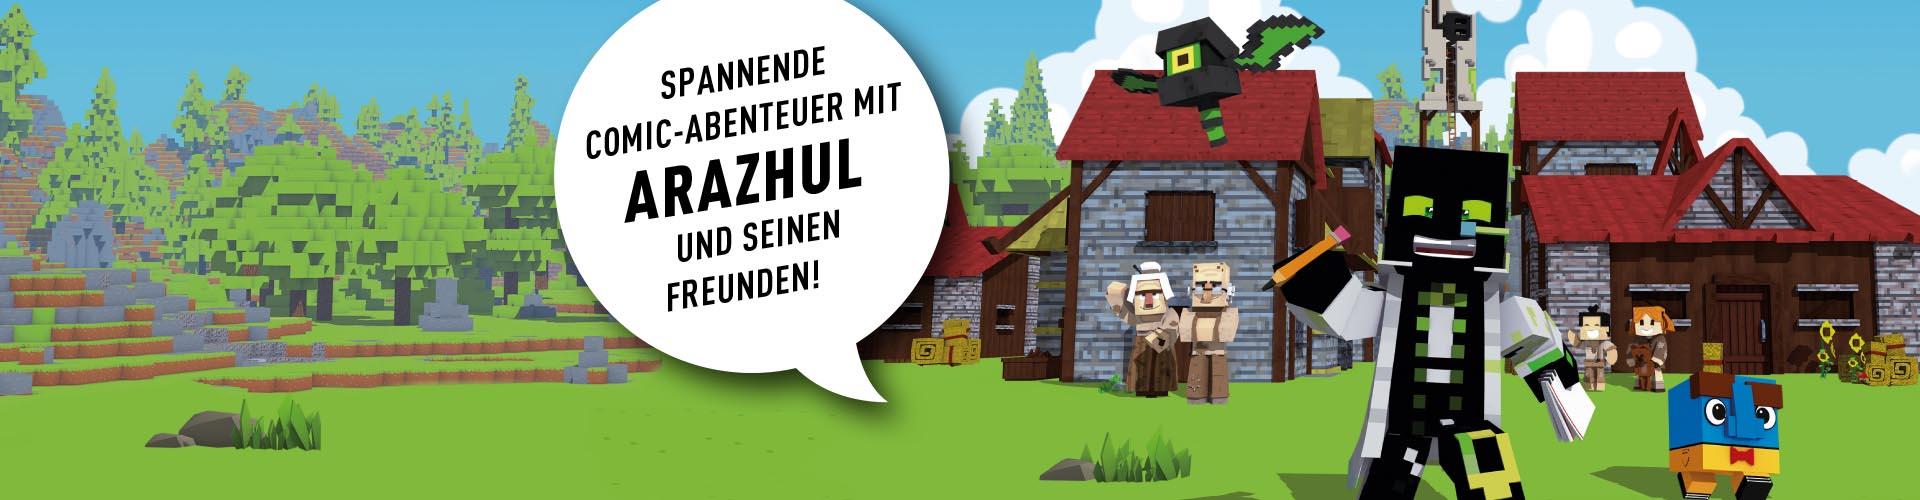 Community-Editions-Shop-Arazhul-Header-1